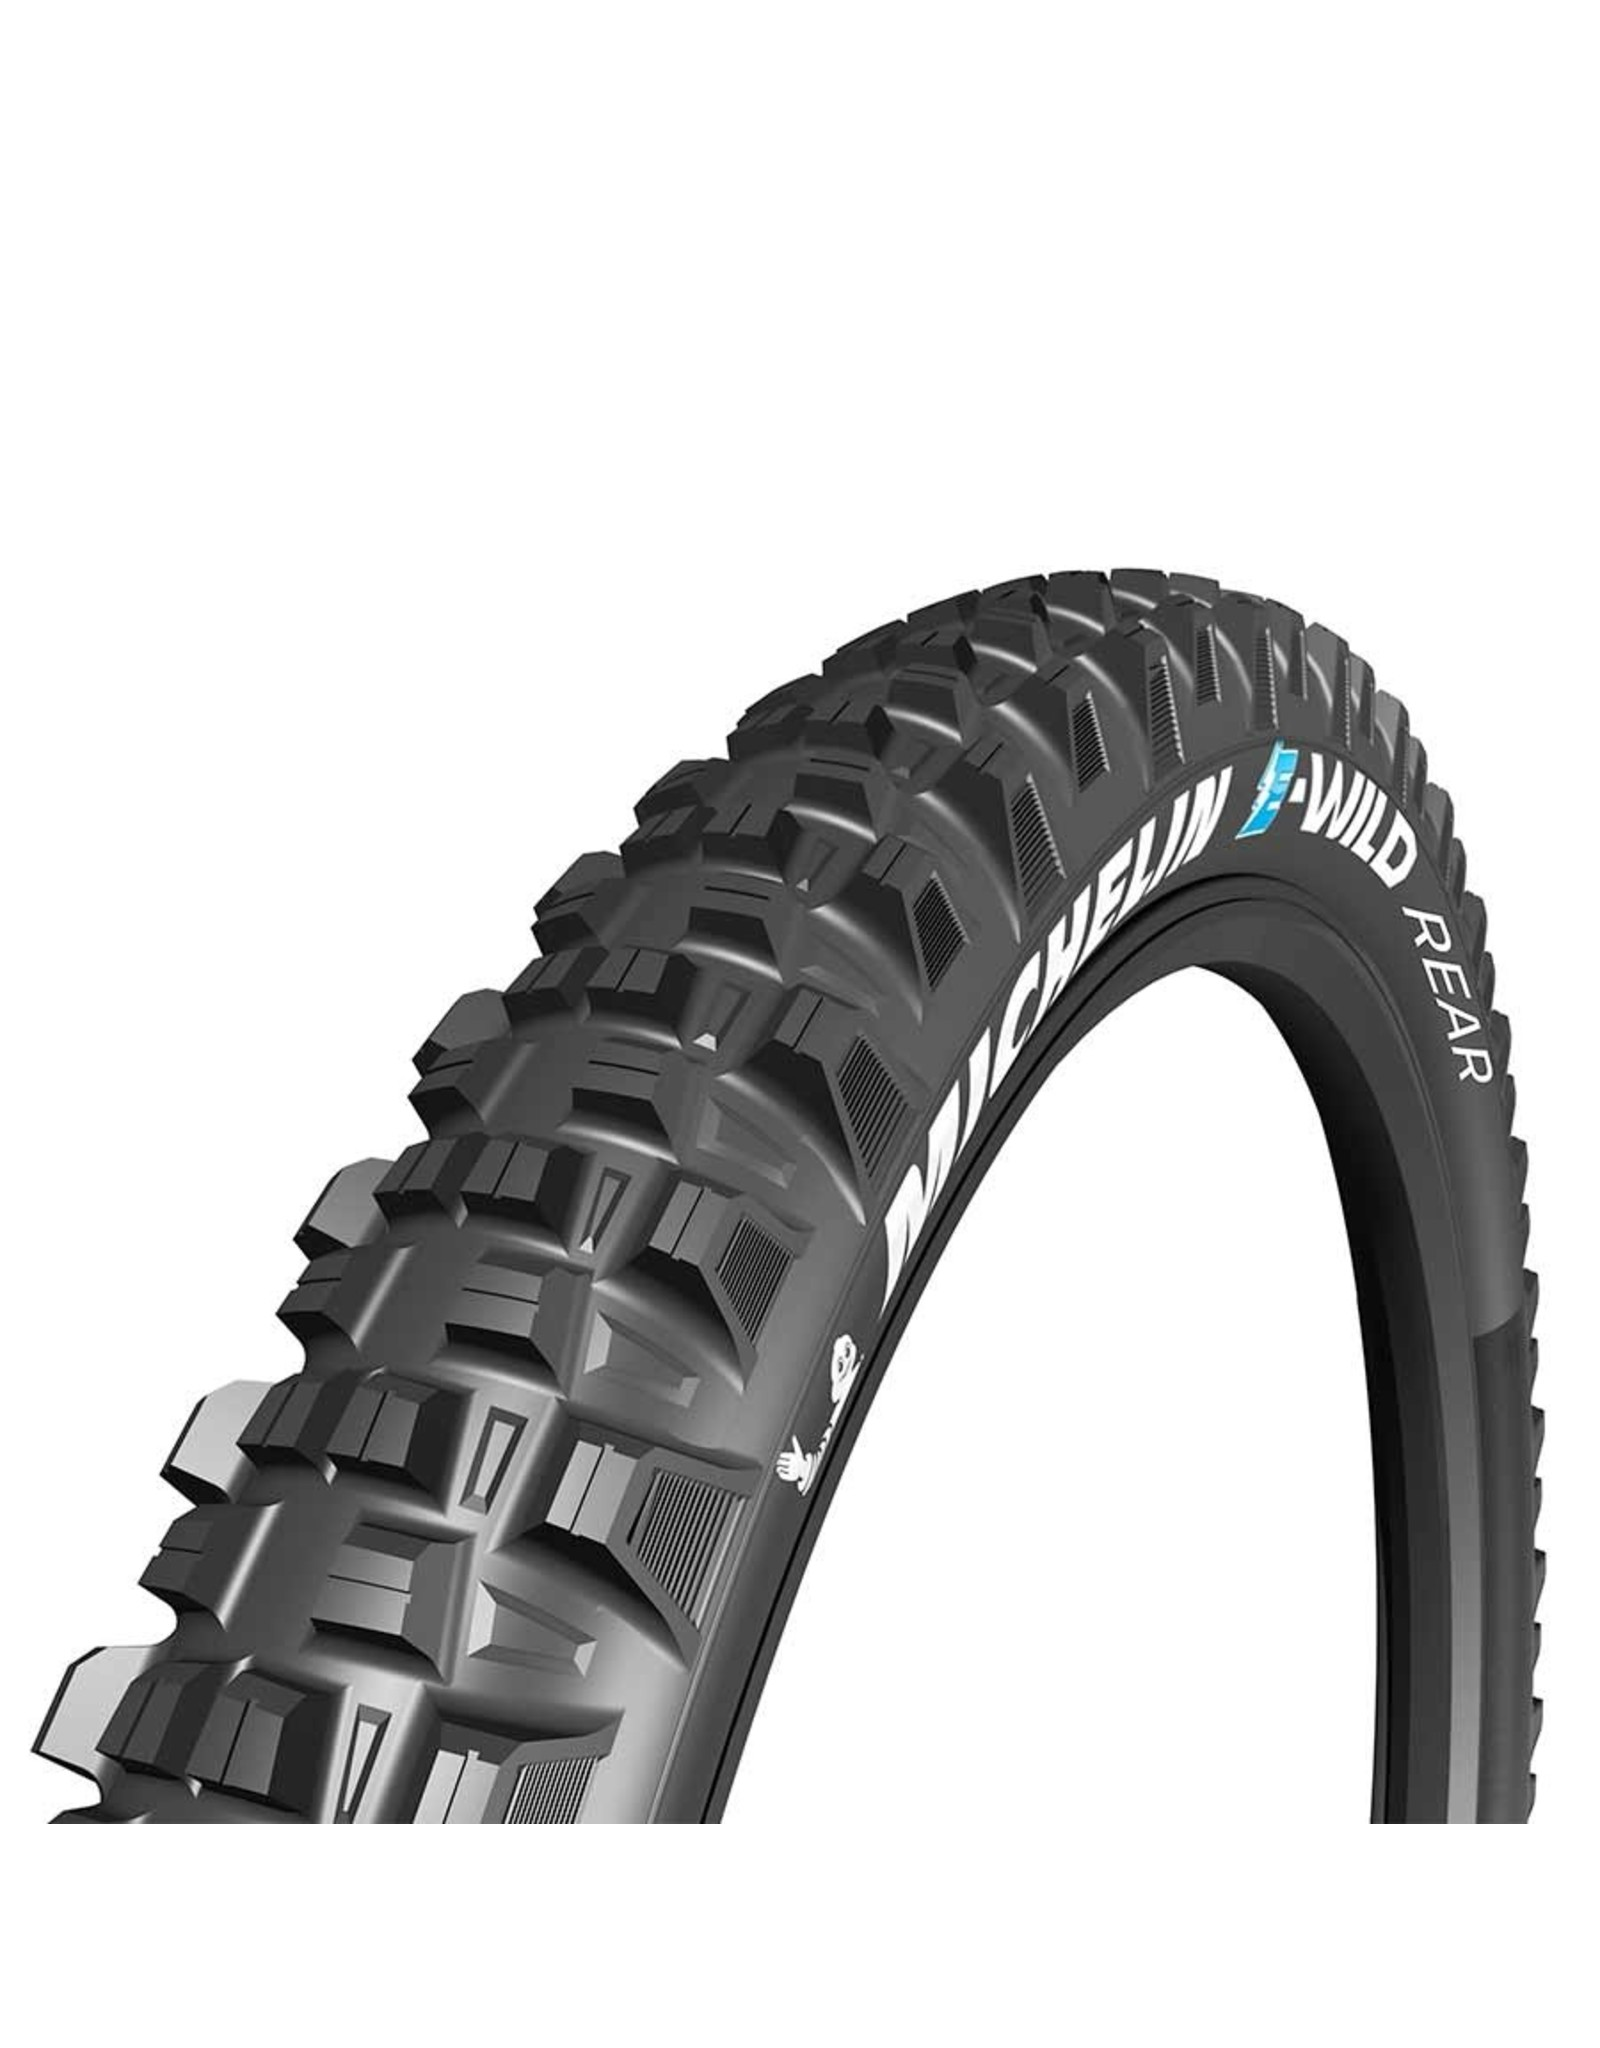 Michelin, E-Wild Rear, Tire, 27.5''x2.80, Folding, Tubeless Ready, E-GUM-X, GravityShield, 3x60TPI, Black